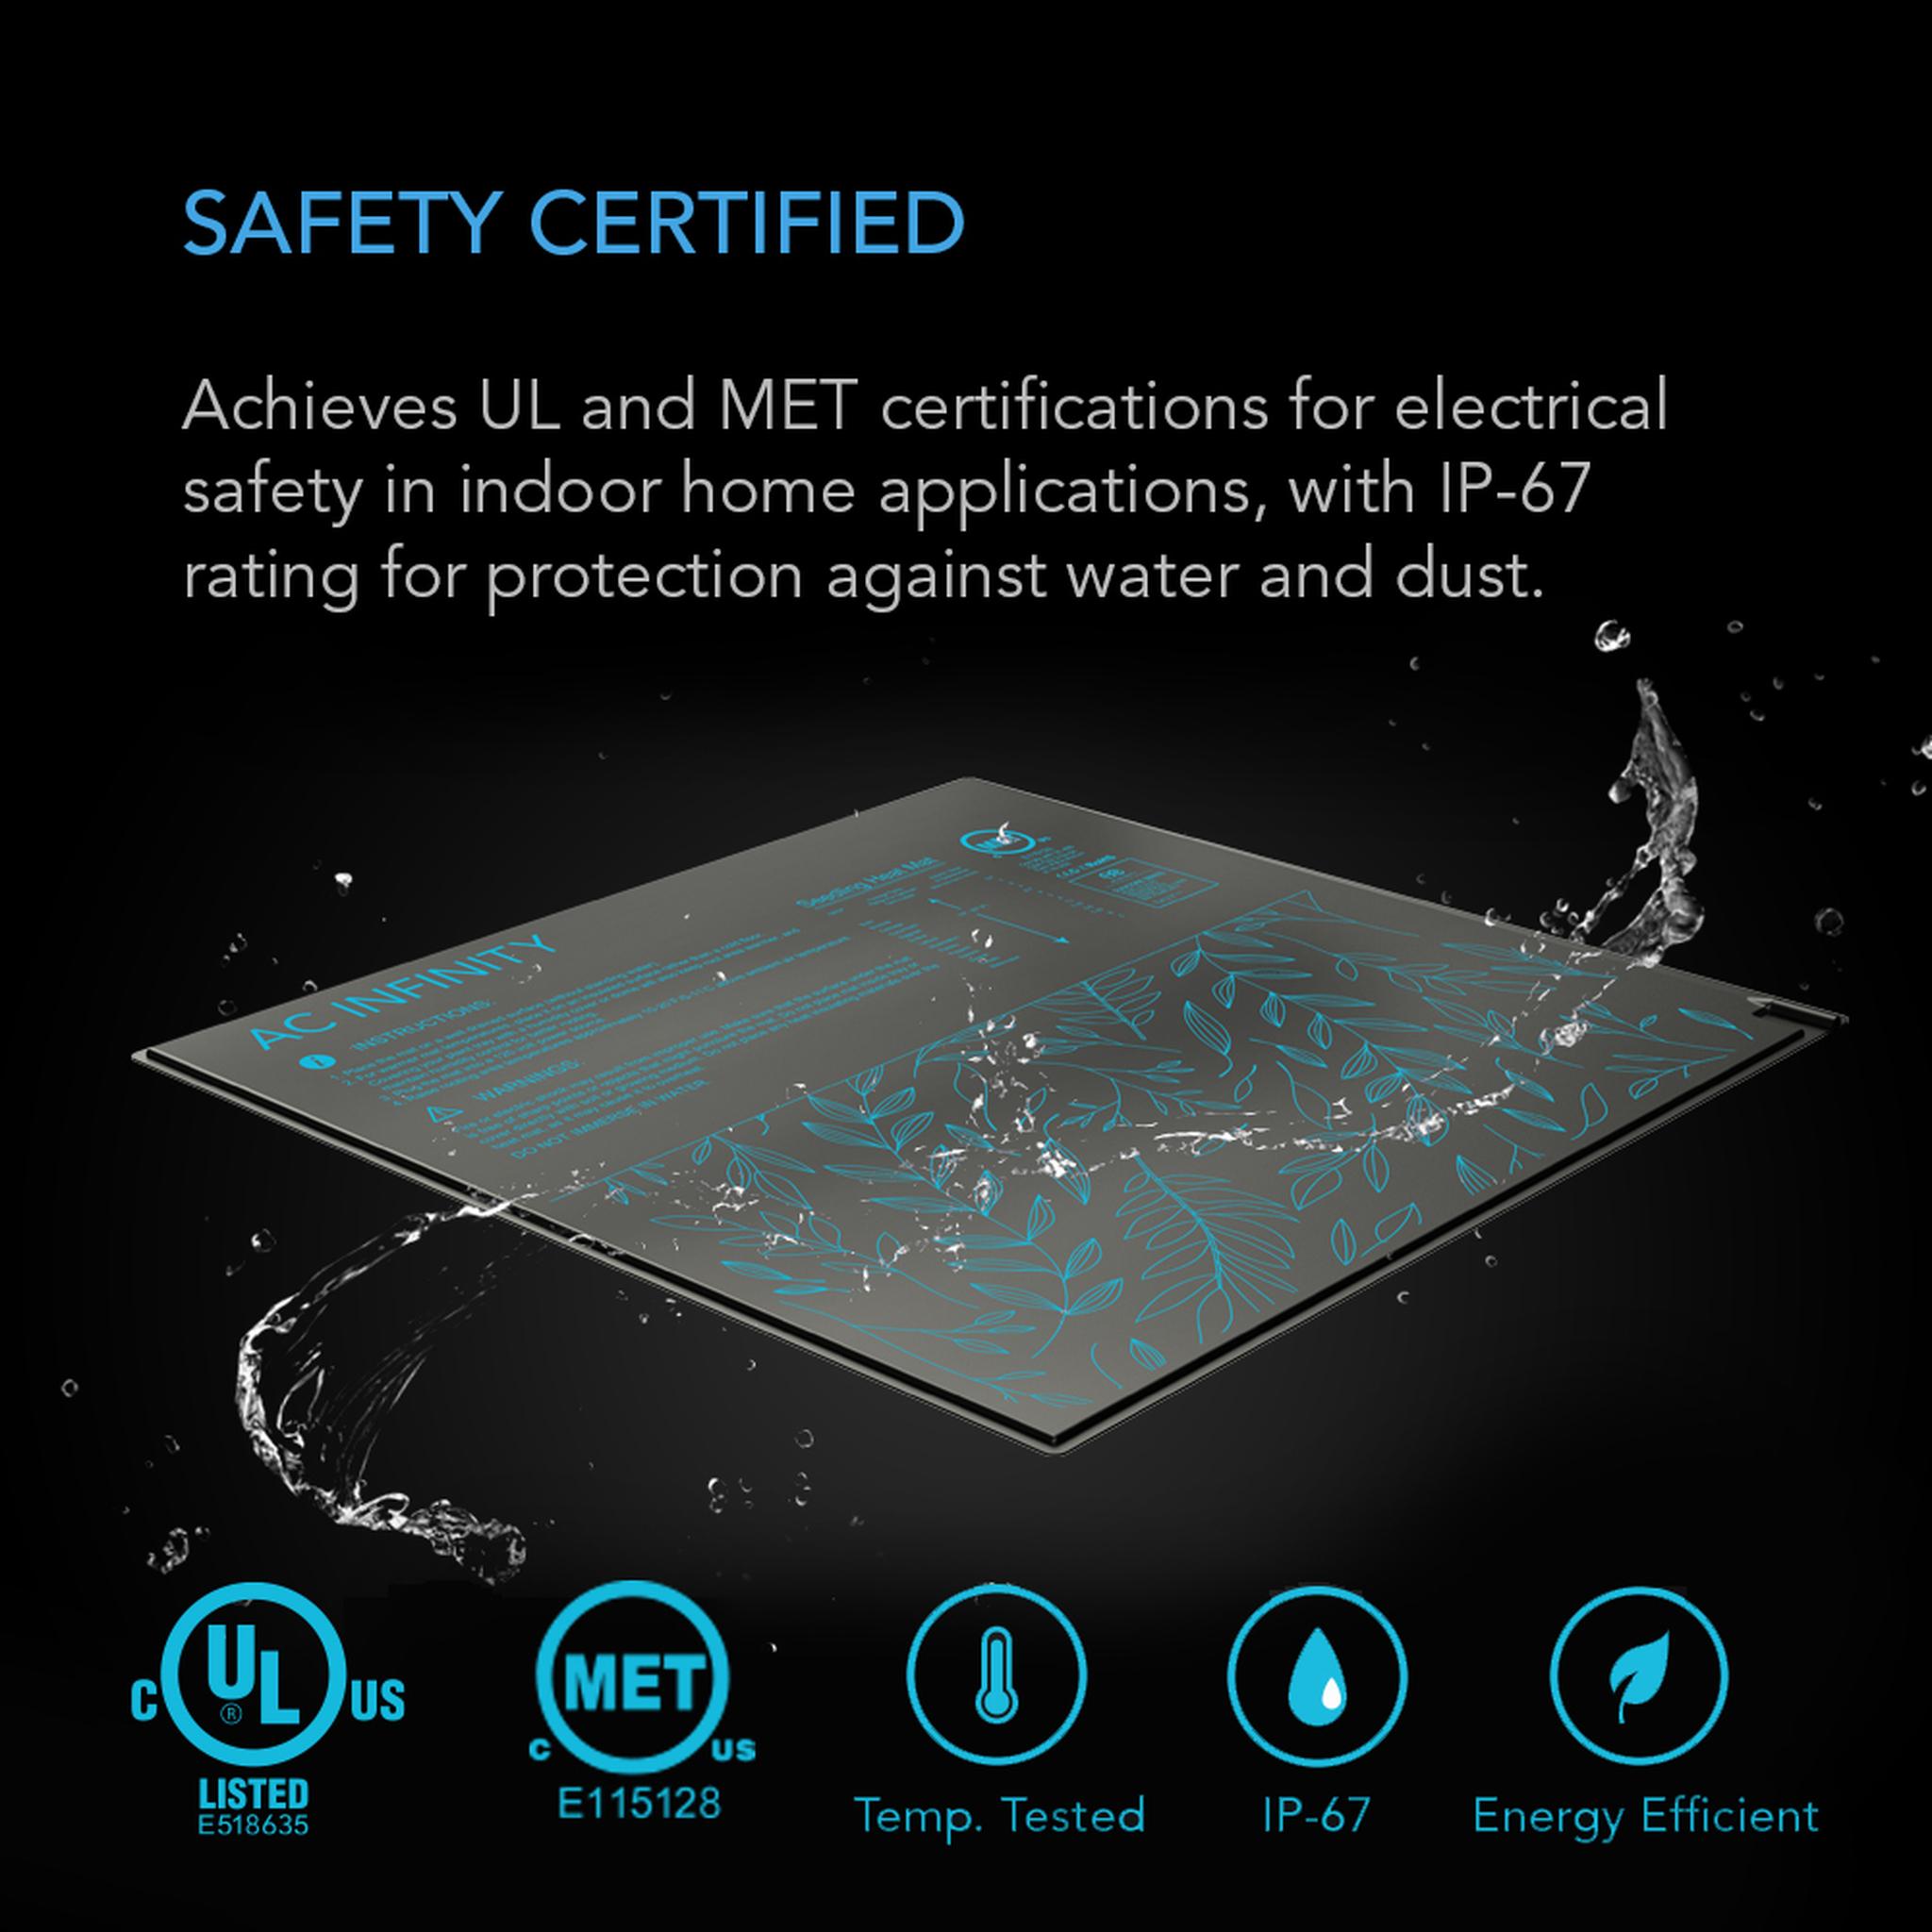 Safety Certified Heat Mats